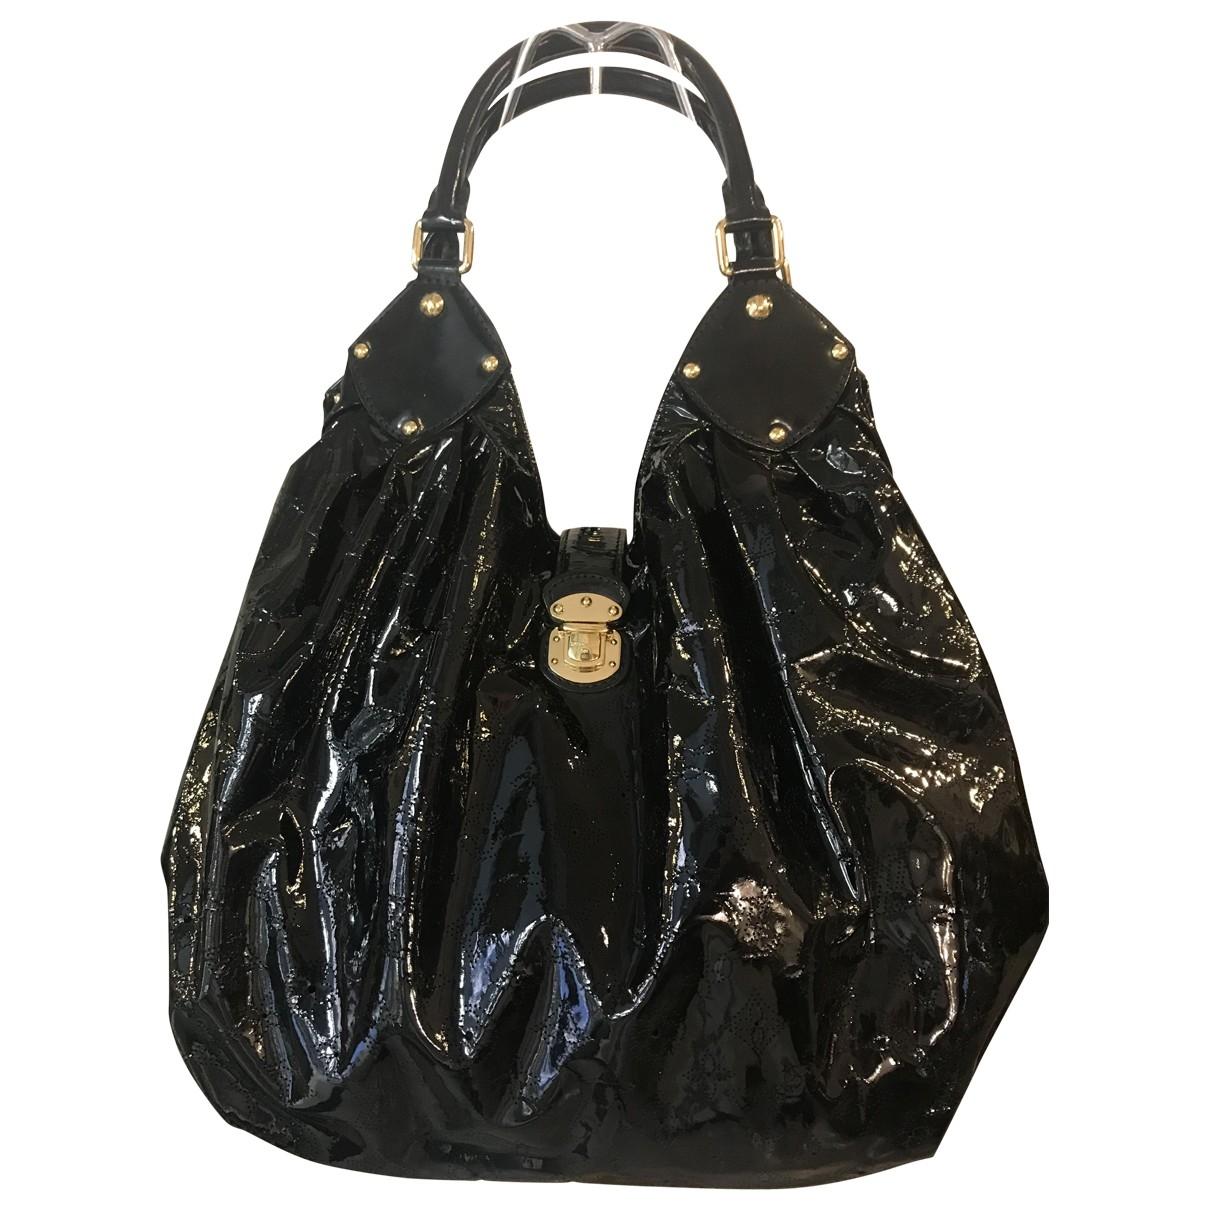 Louis Vuitton Mahina Handtasche in  Schwarz Lackleder